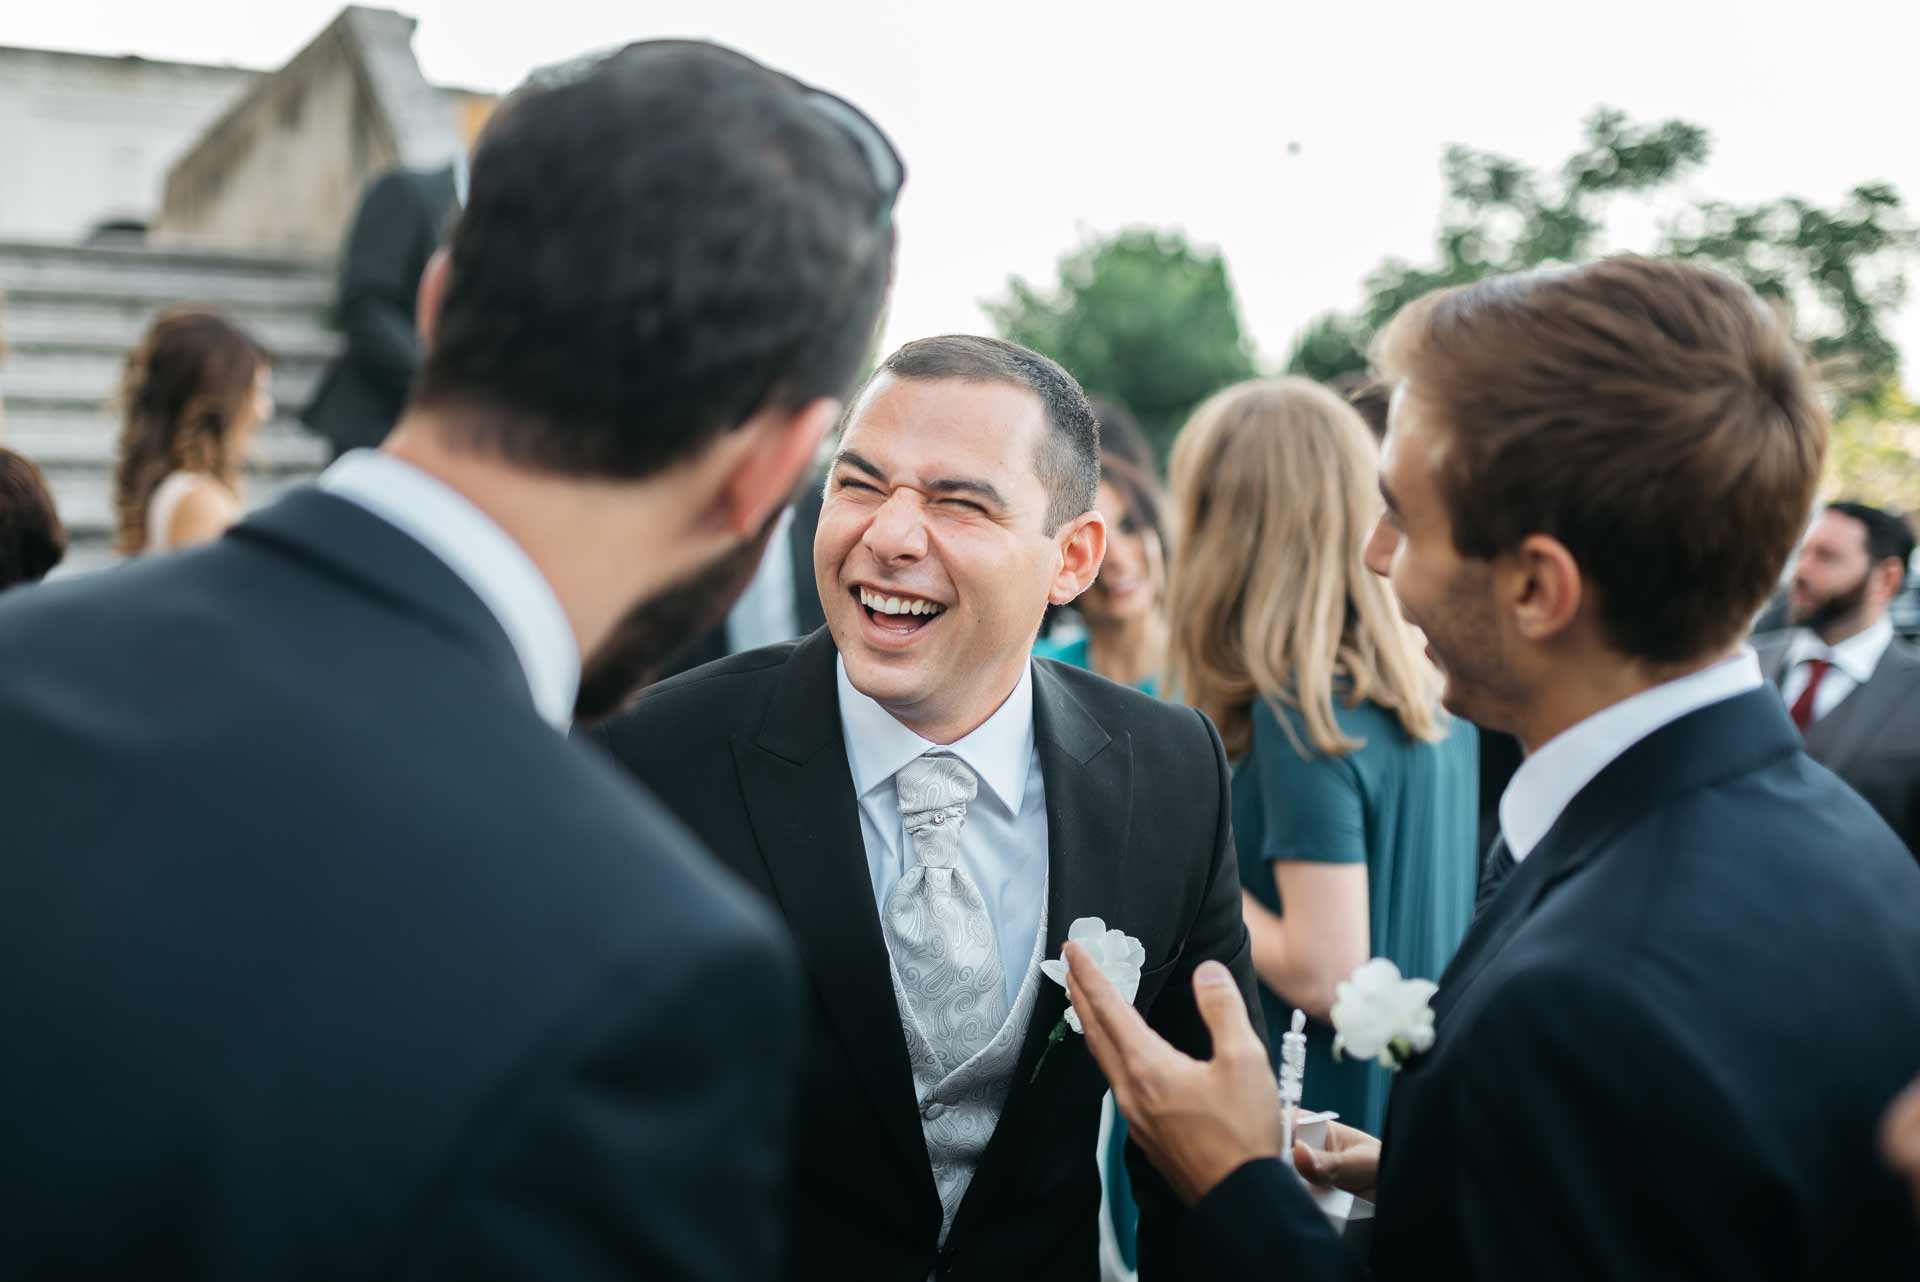 Candid-wedding-photos-2